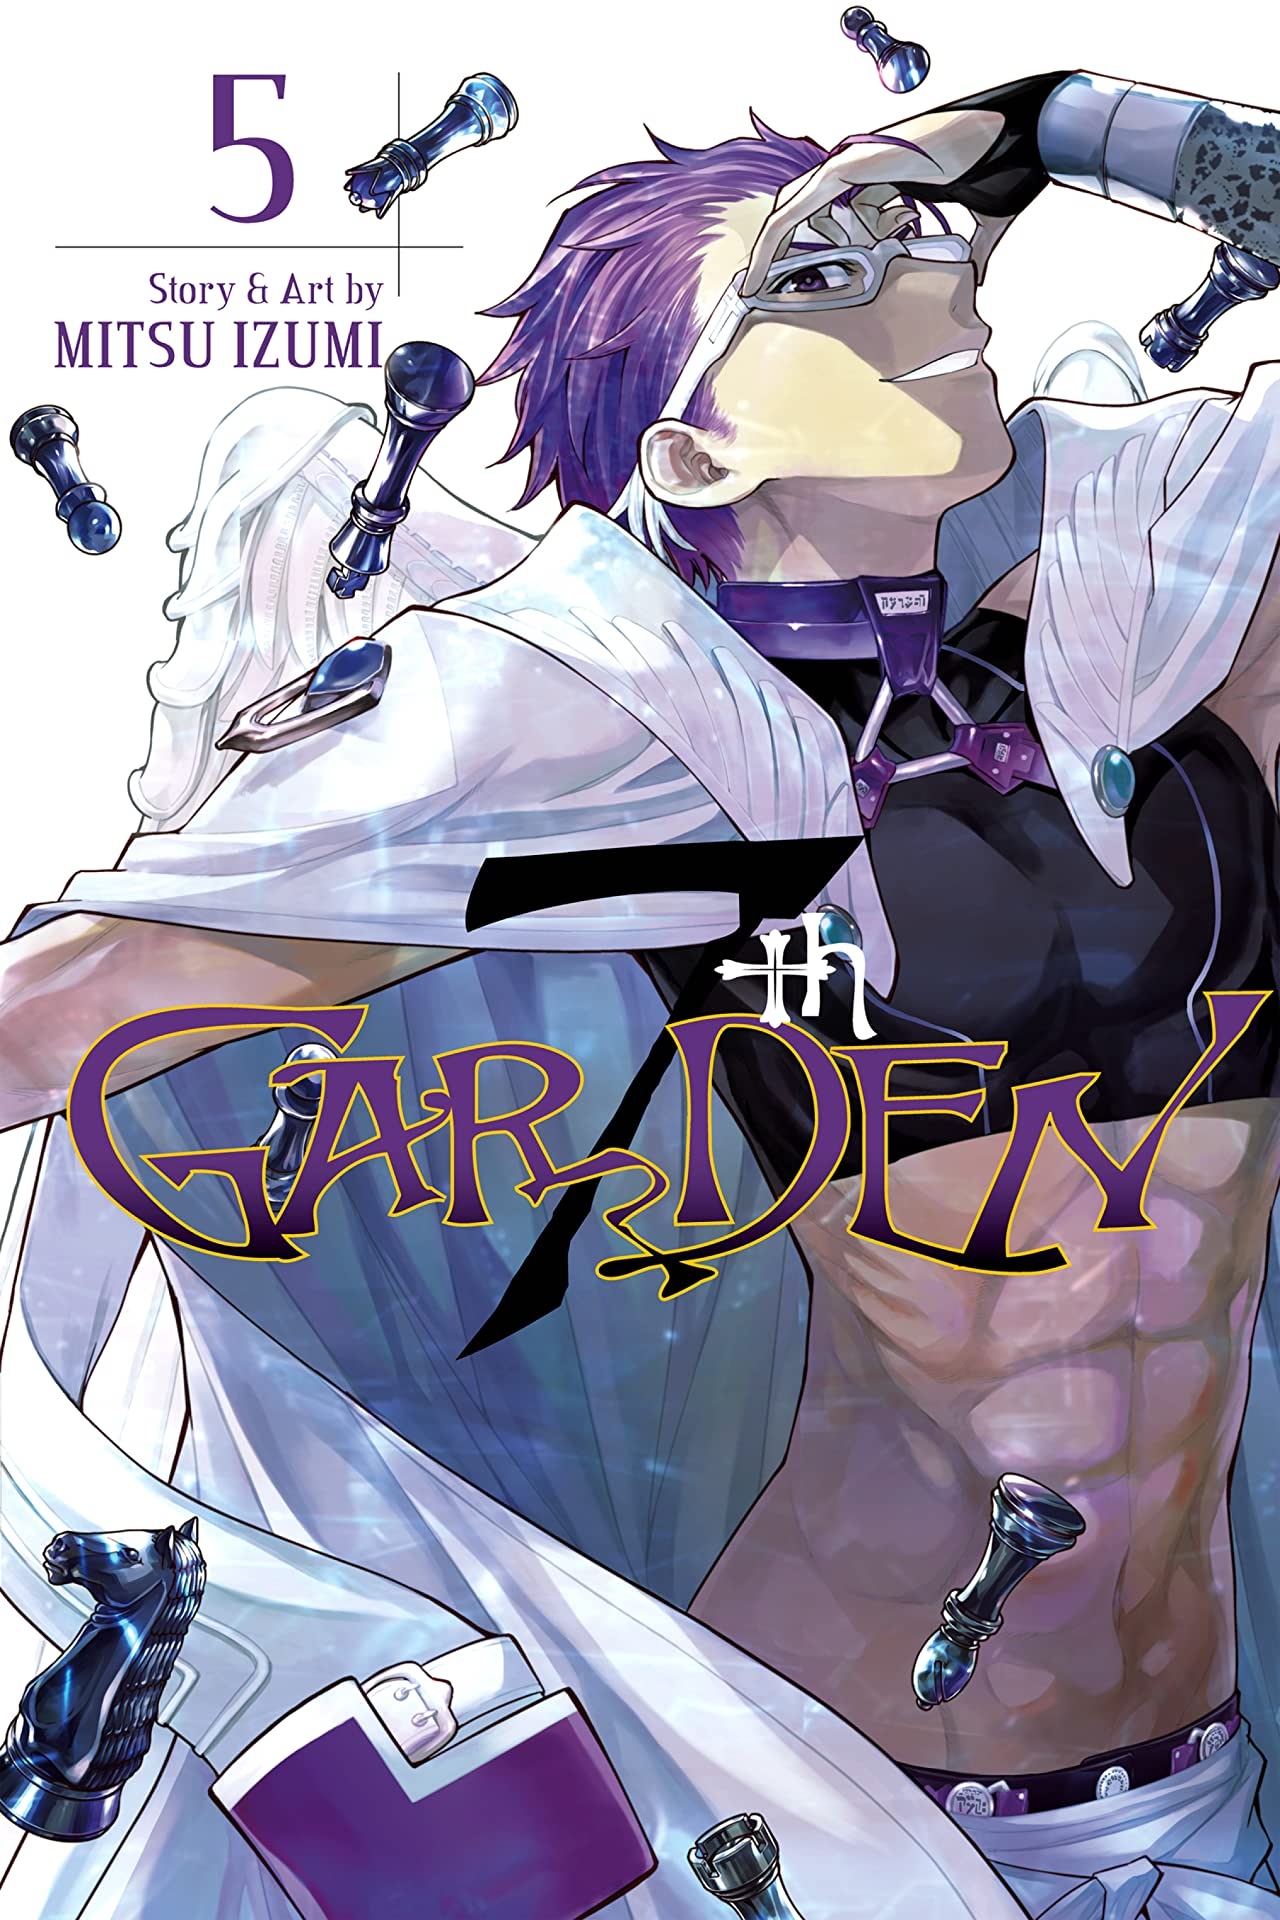 7thGARDEN Vol. 5